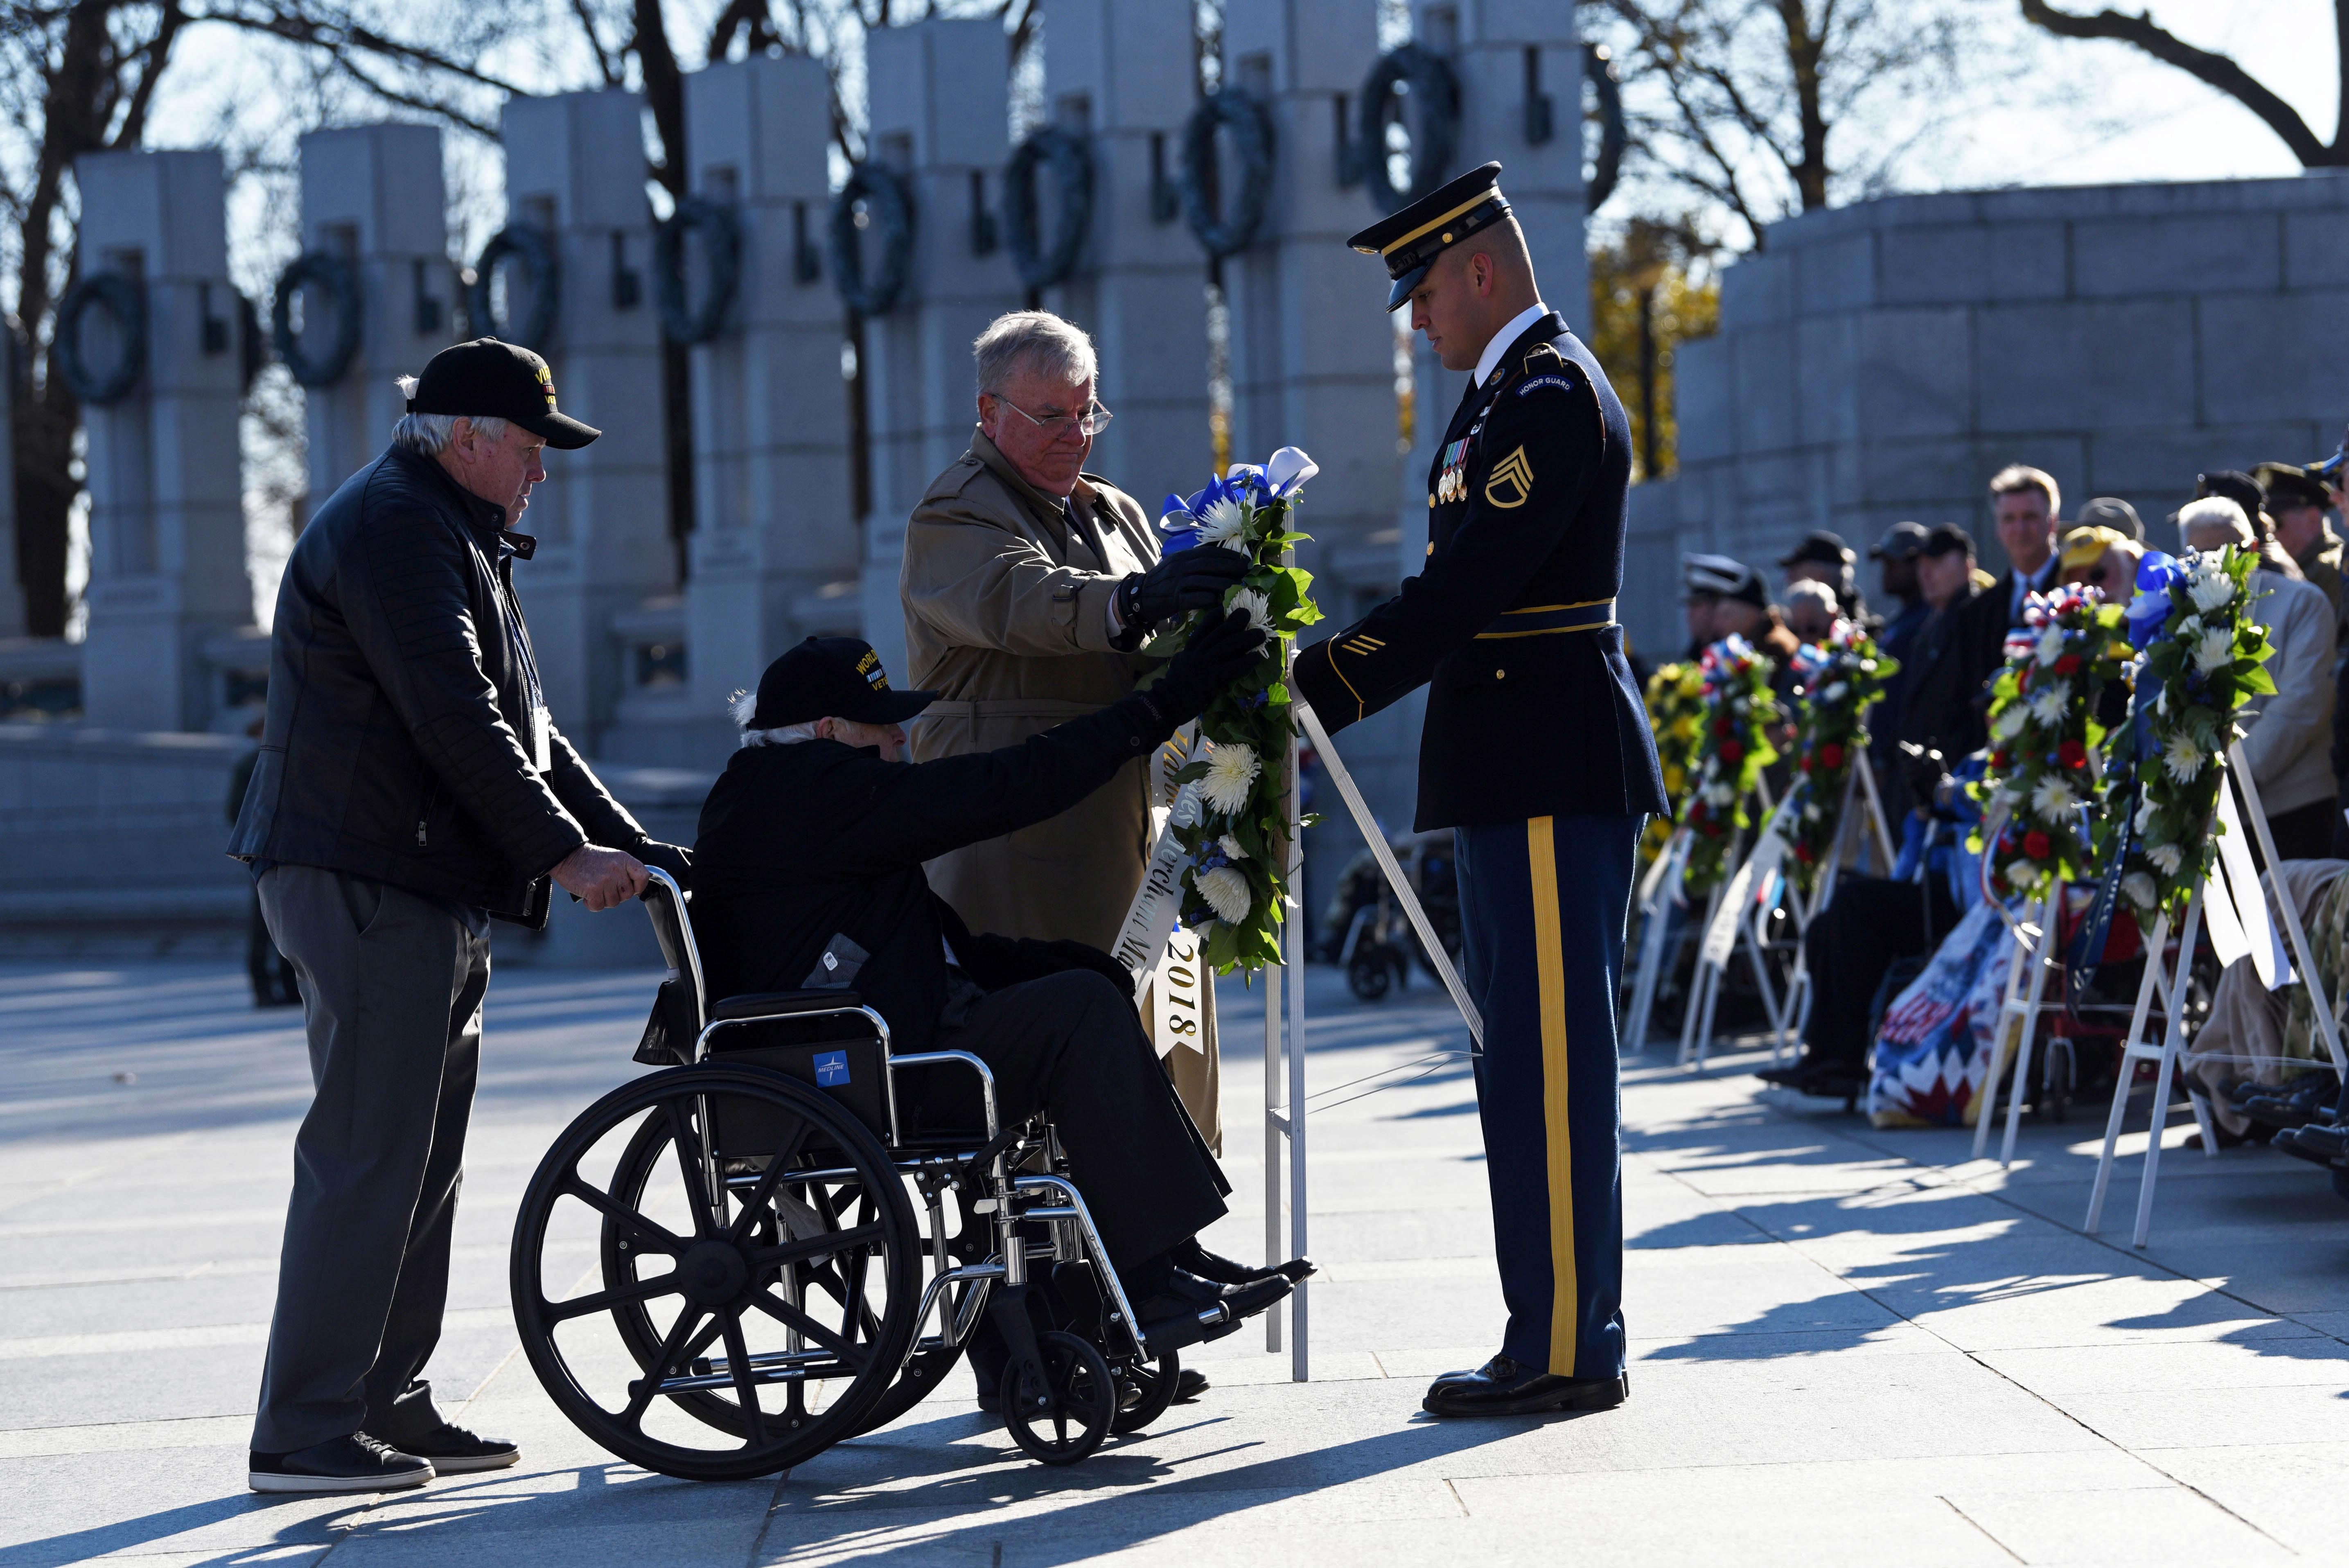 veteran placing a wreath in Washington on Pearl Harbor day